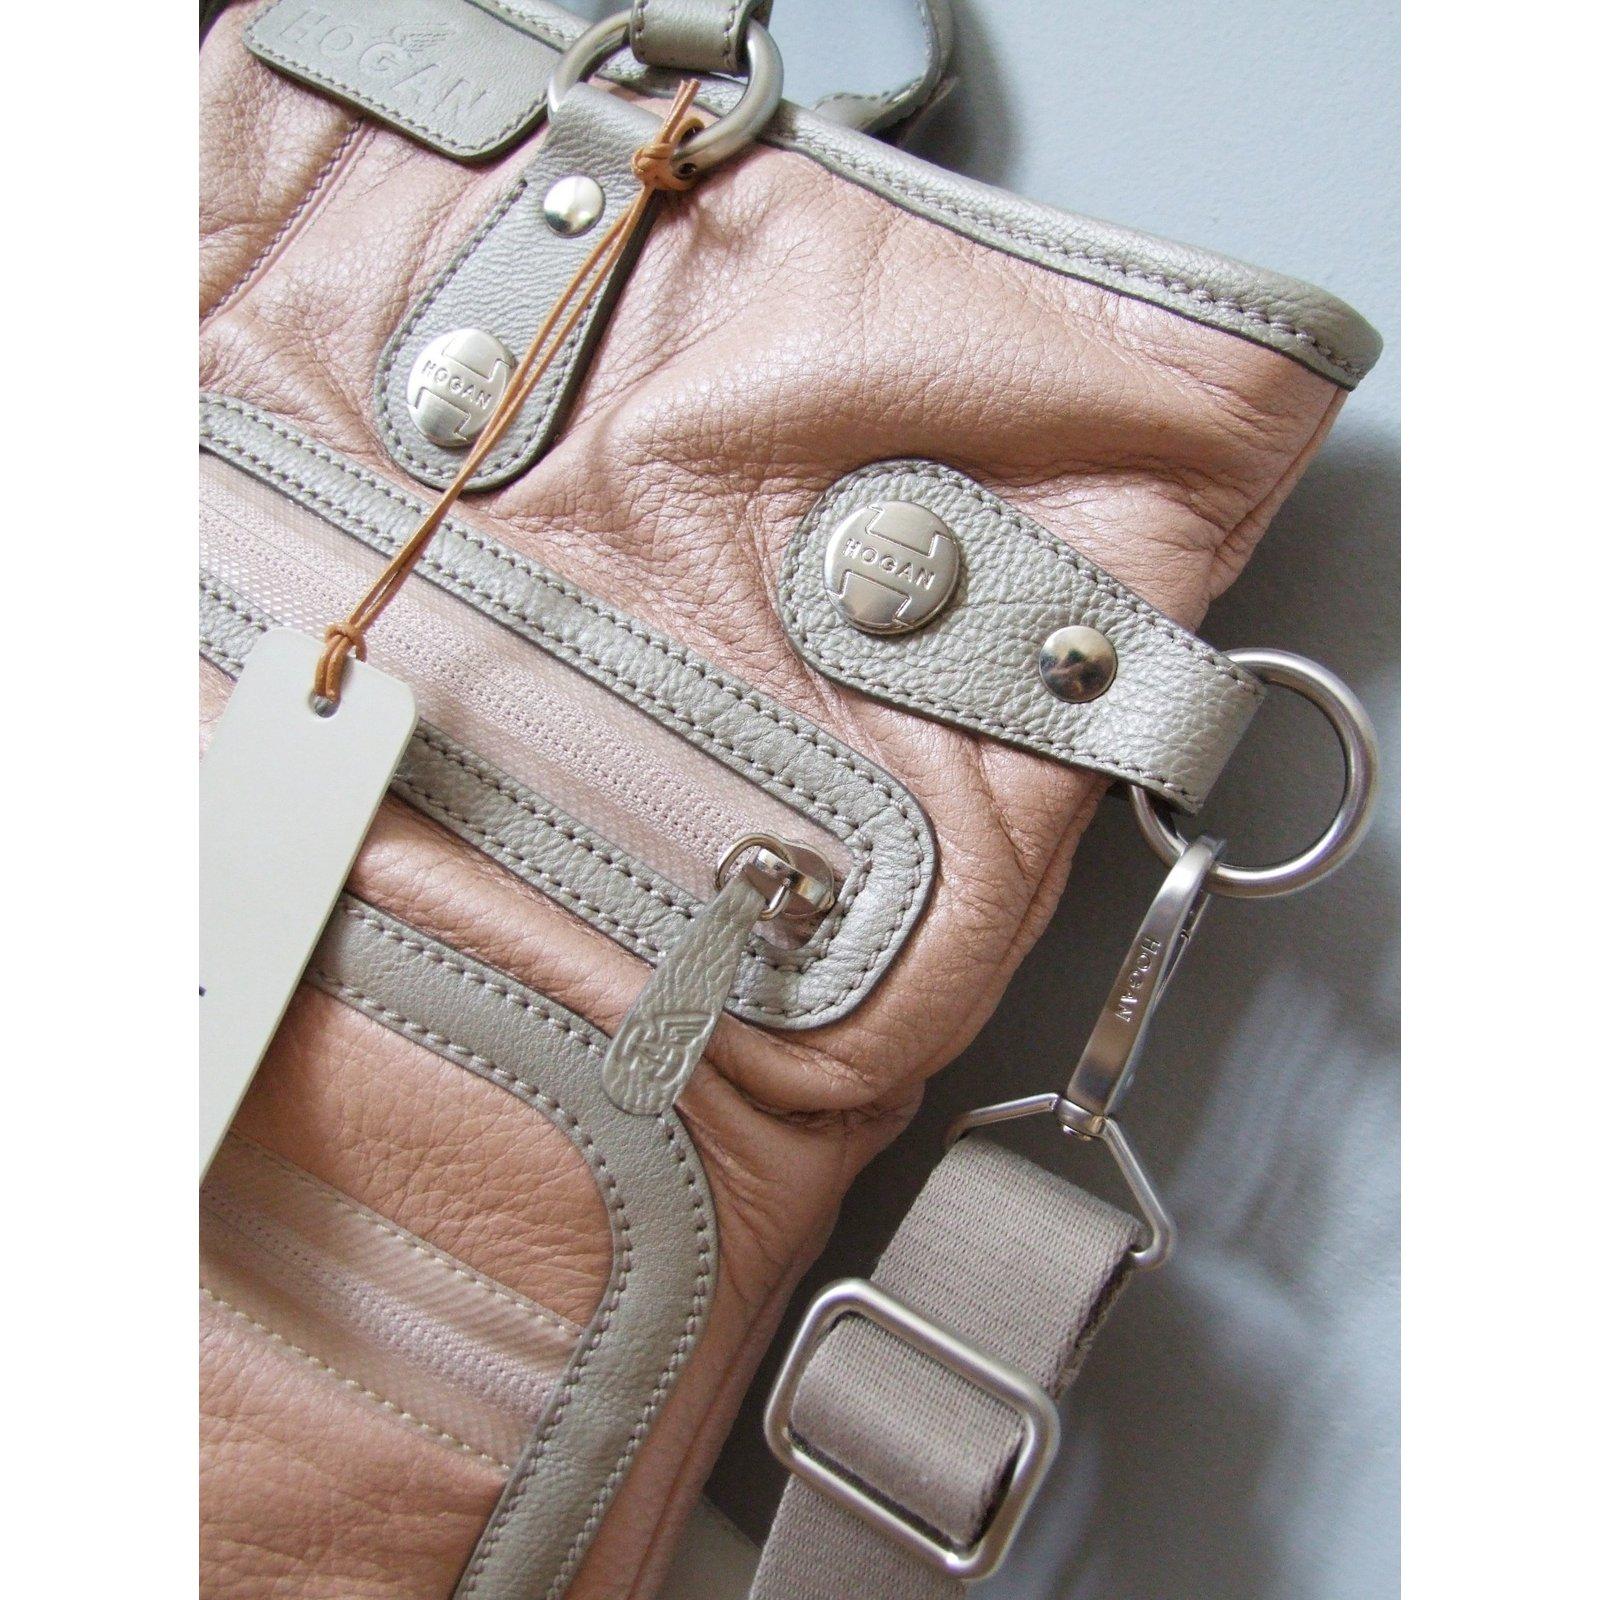 c544e30c8a ... Women s bags Hogan · Handbags Hogan · Facebook · Pin This